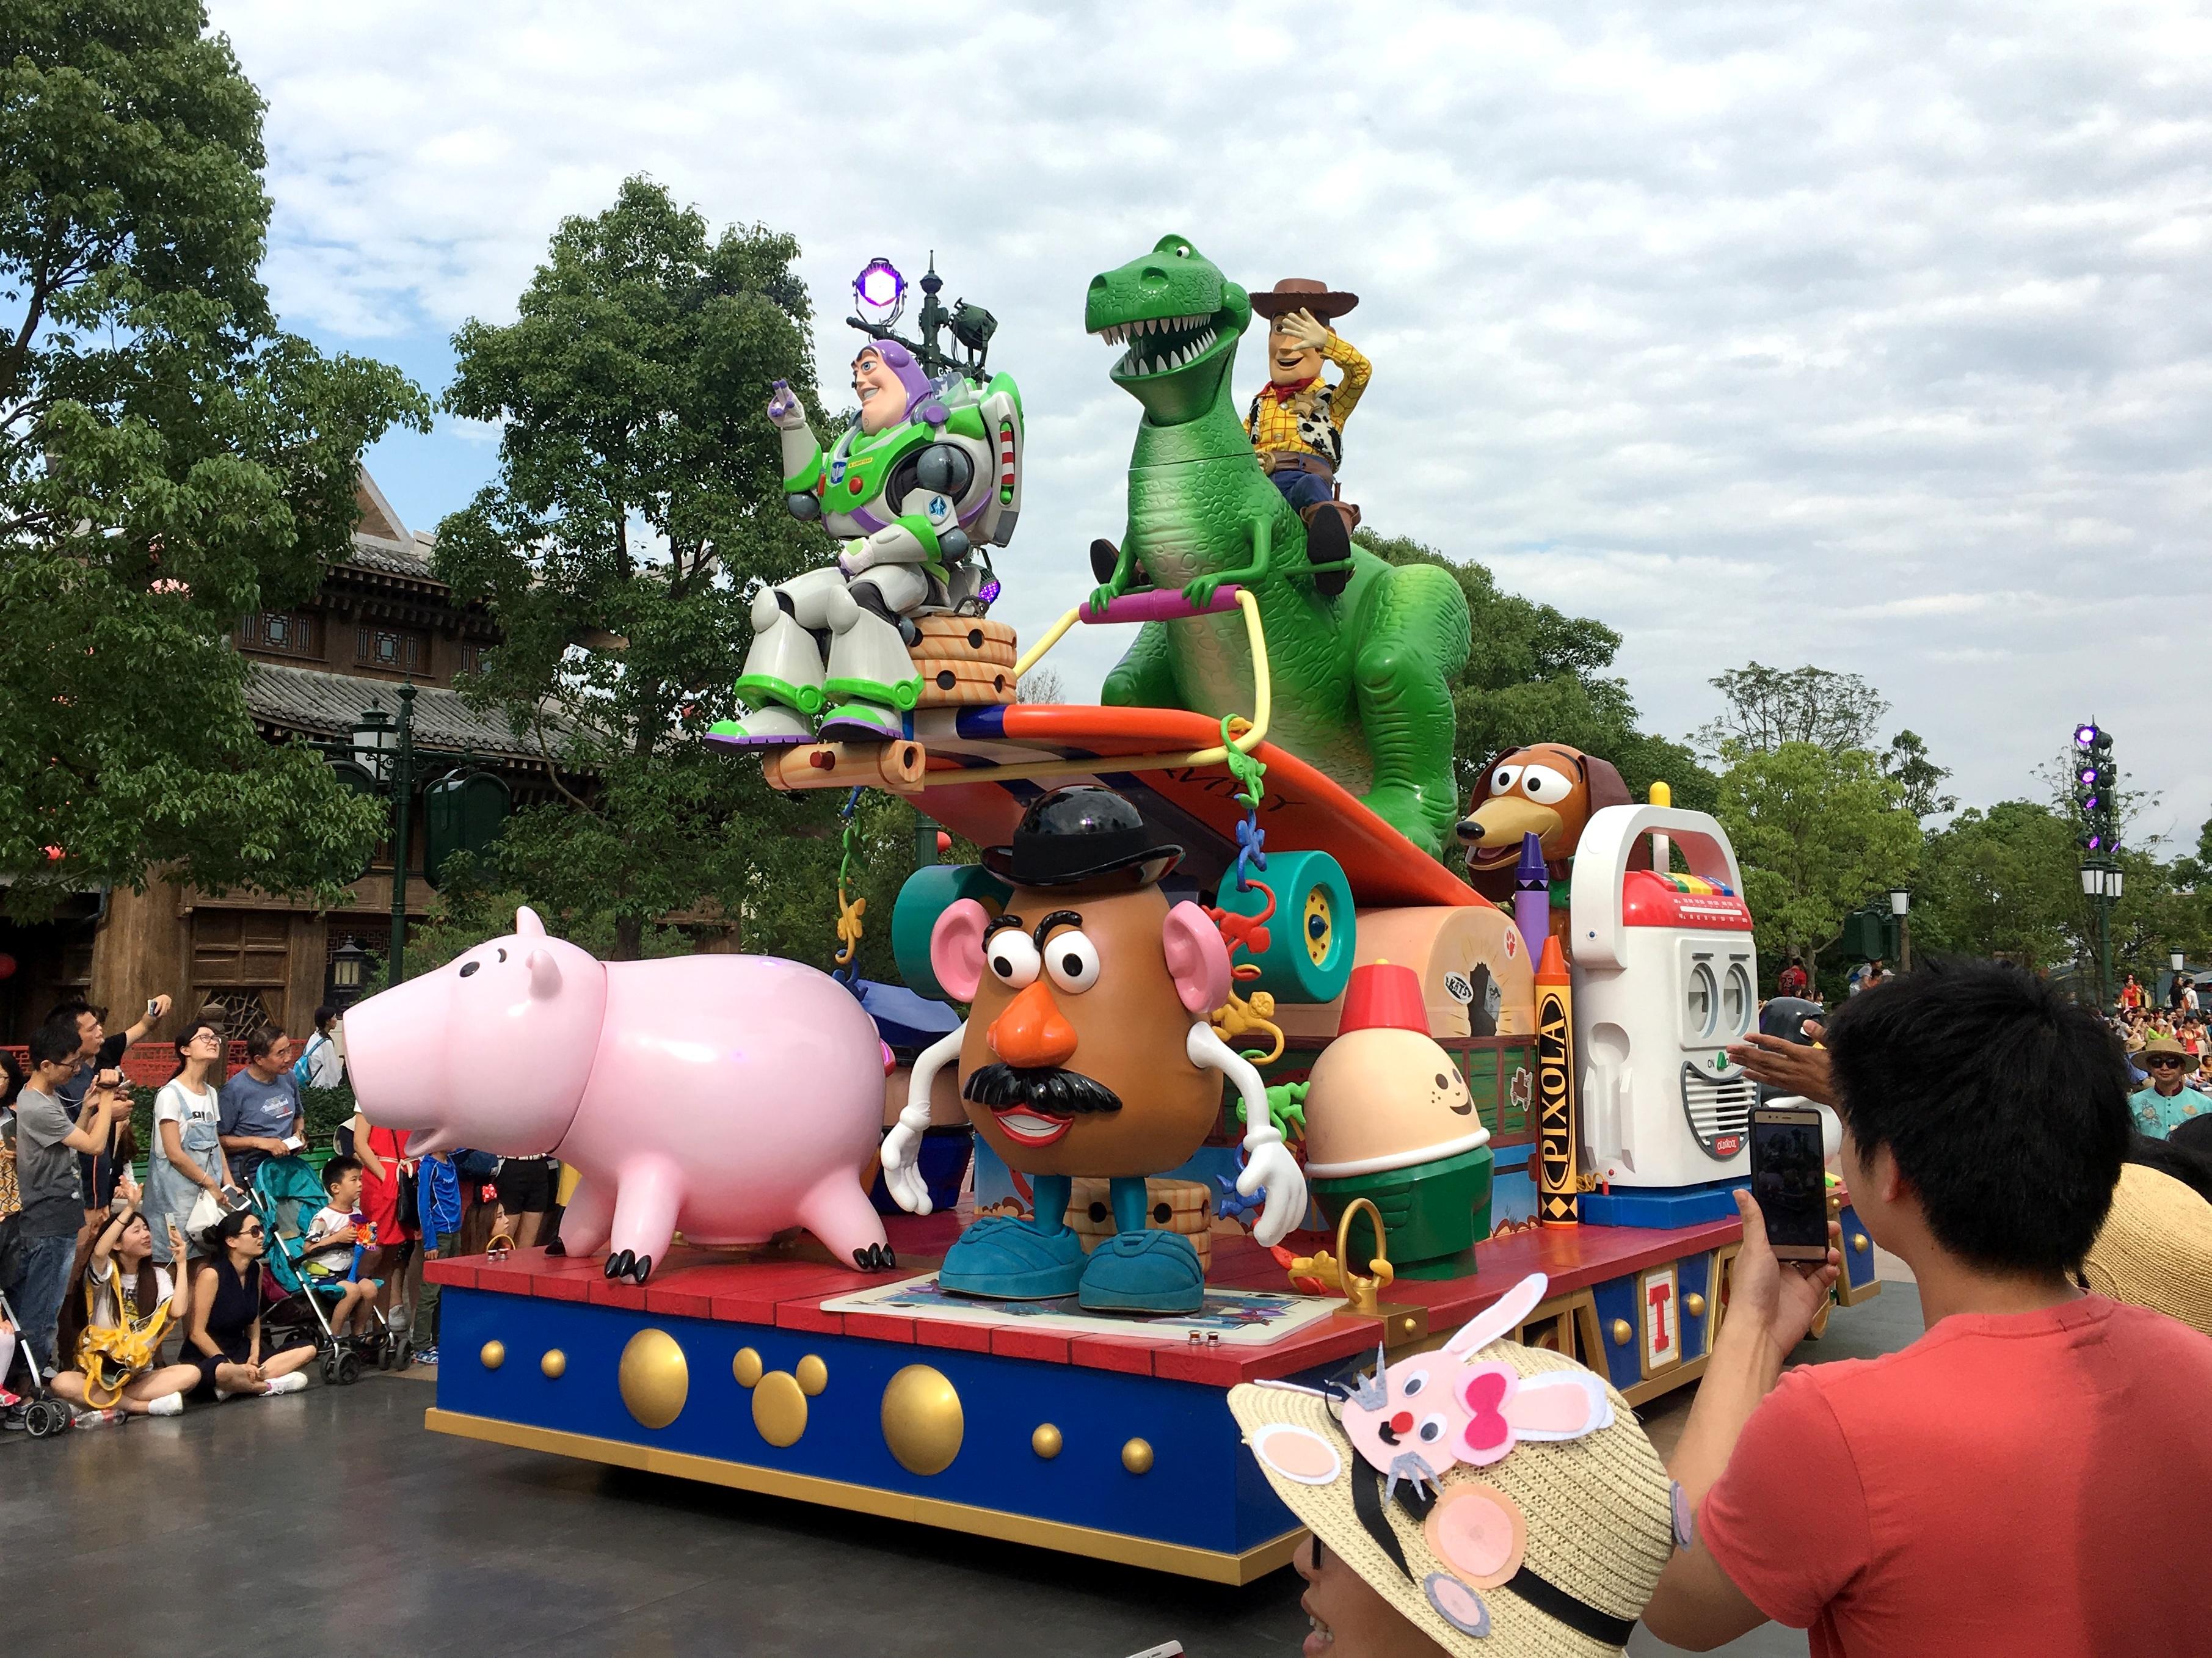 shanghai-disneyland-mickeys-storybook-express-parade-1